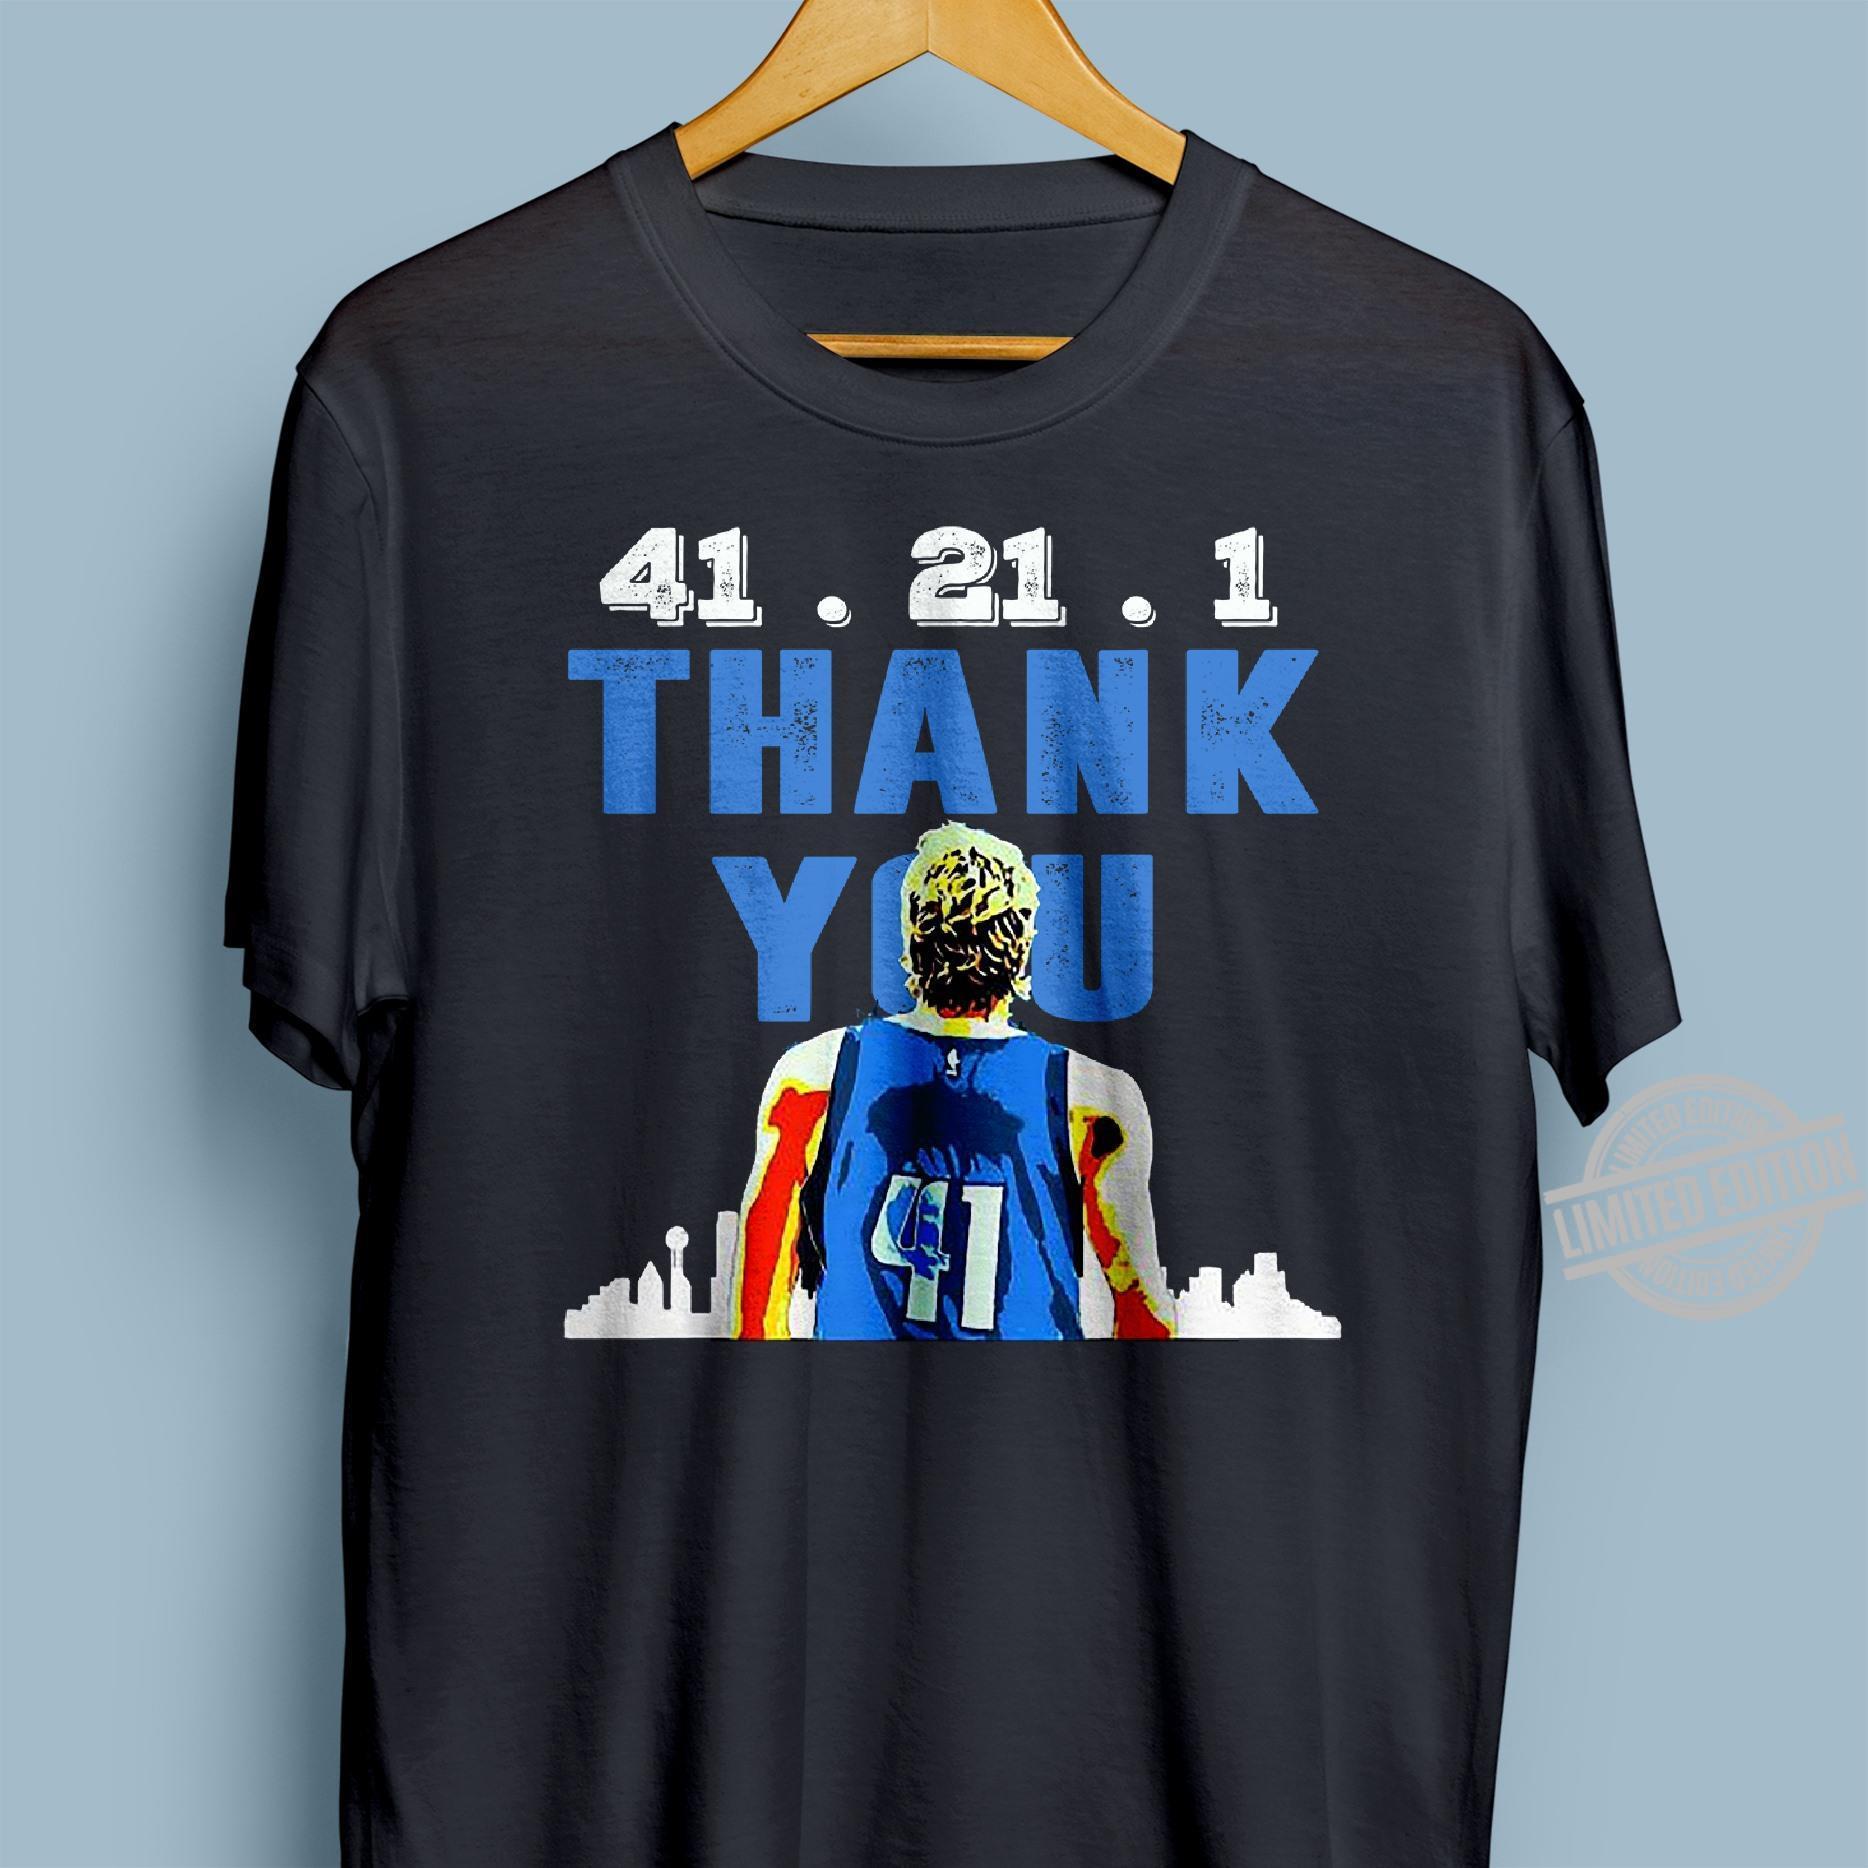 41 21 1 Thank You Shirt